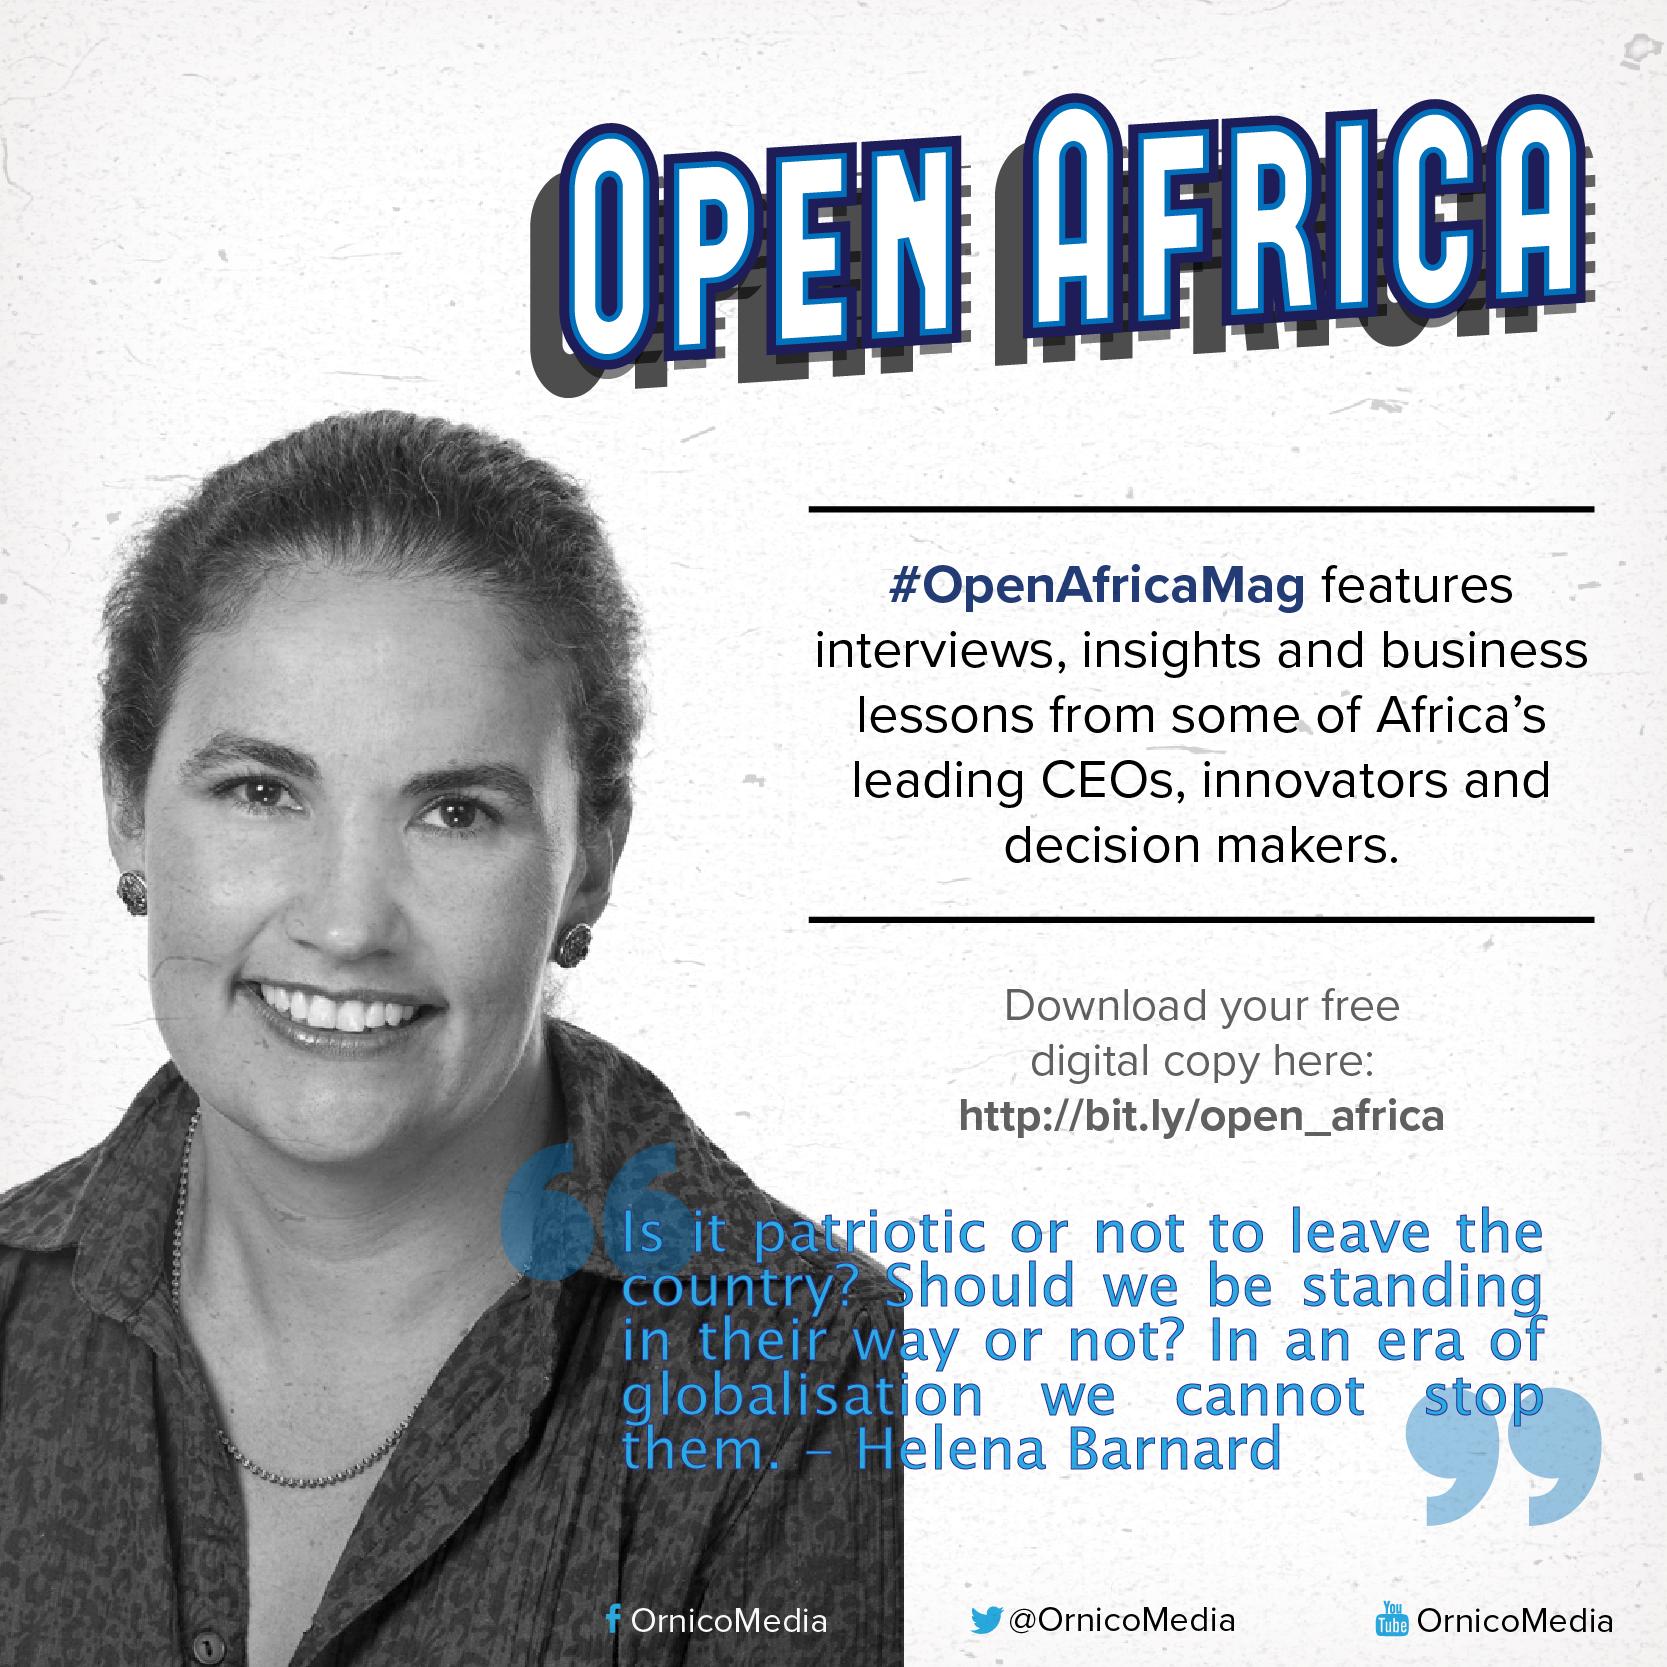 Helena Barnard on #OpenAfricaMag